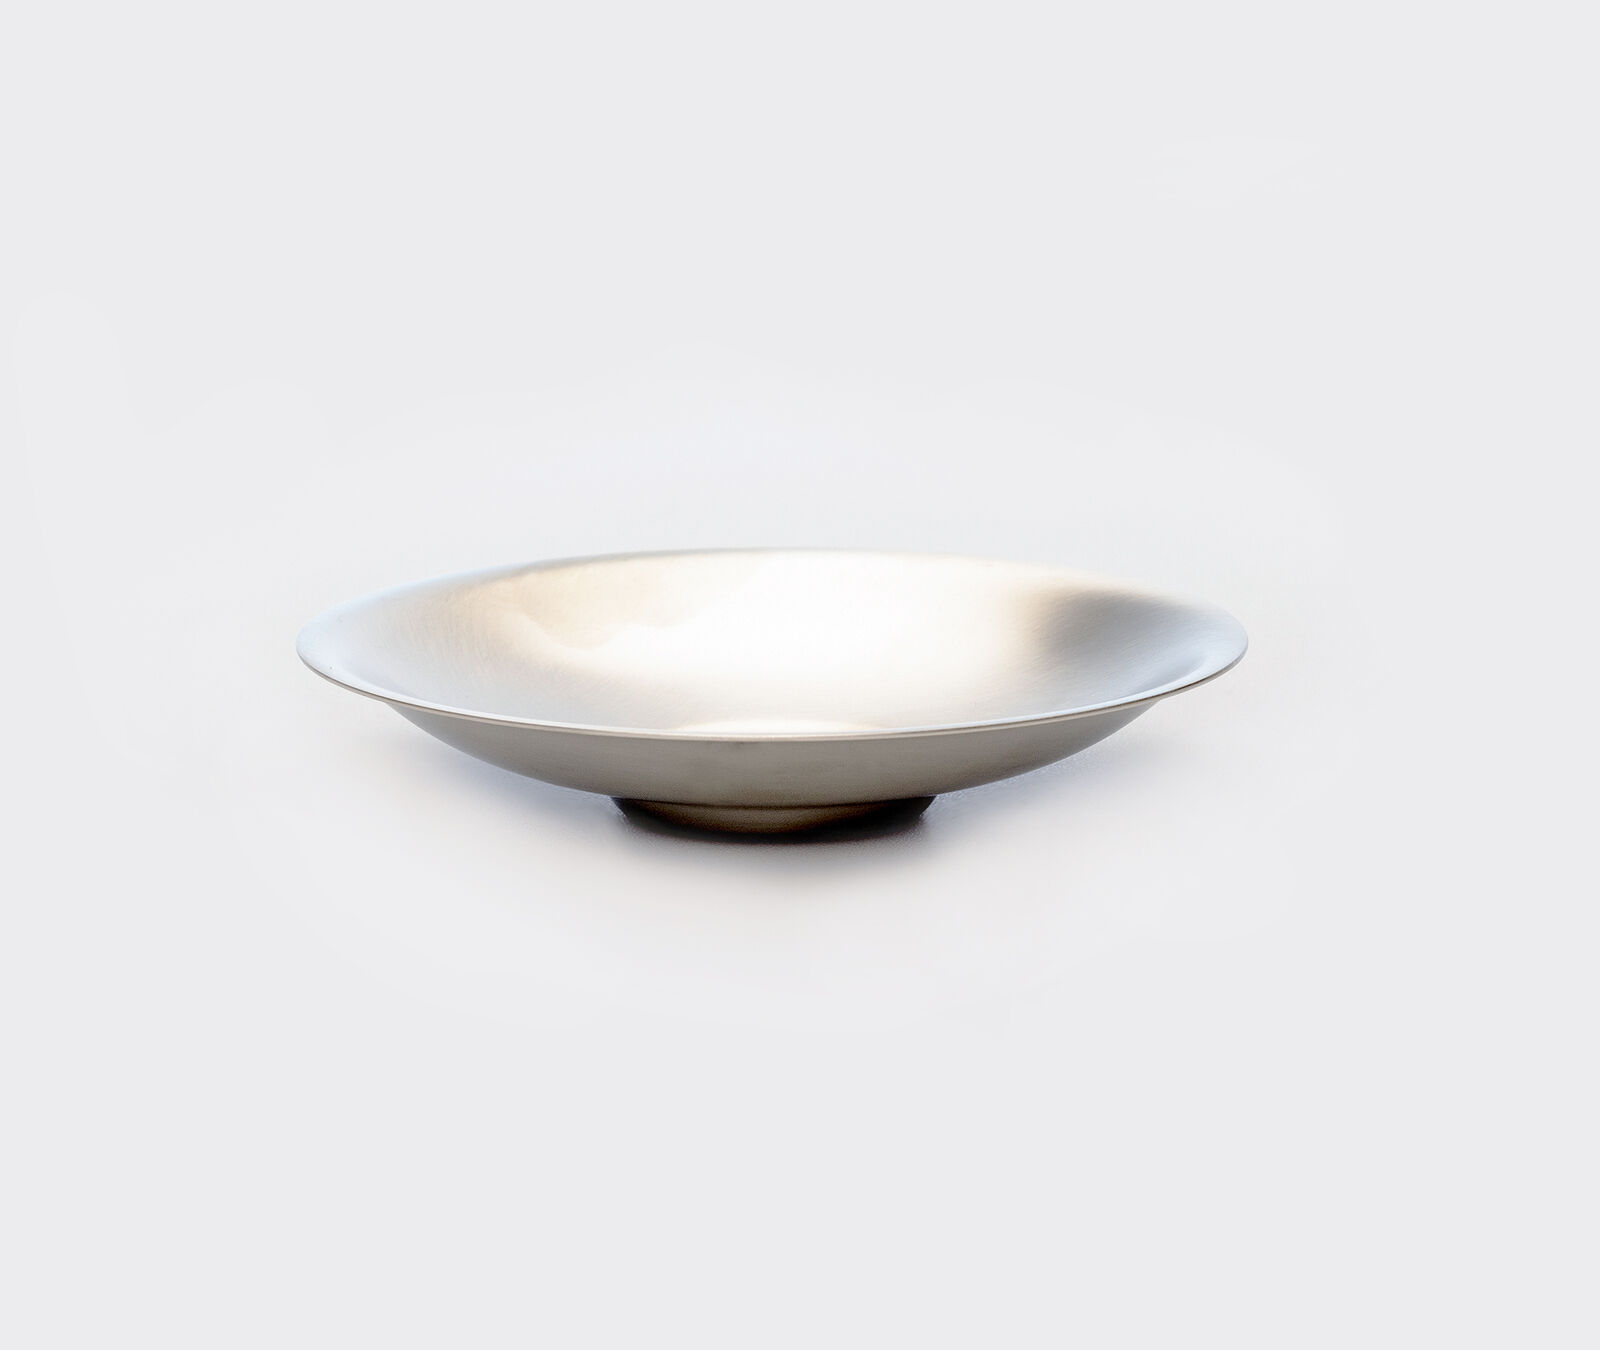 Azmaya Japanese Japanese Japanese Tea Cup Saucer - Brass & Tin-plate a396c0